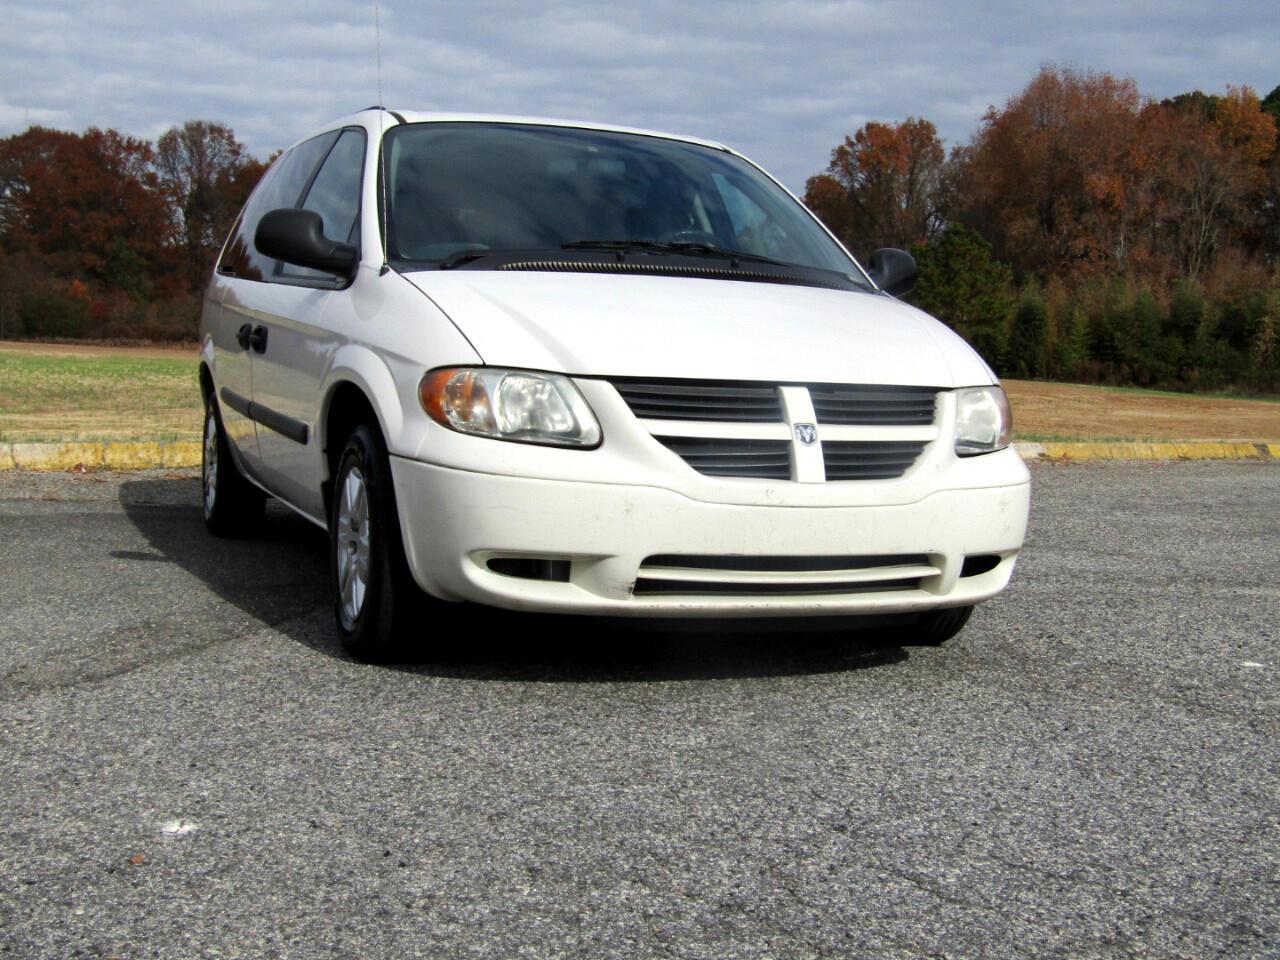 2007 Dodge Grand Caravan SE